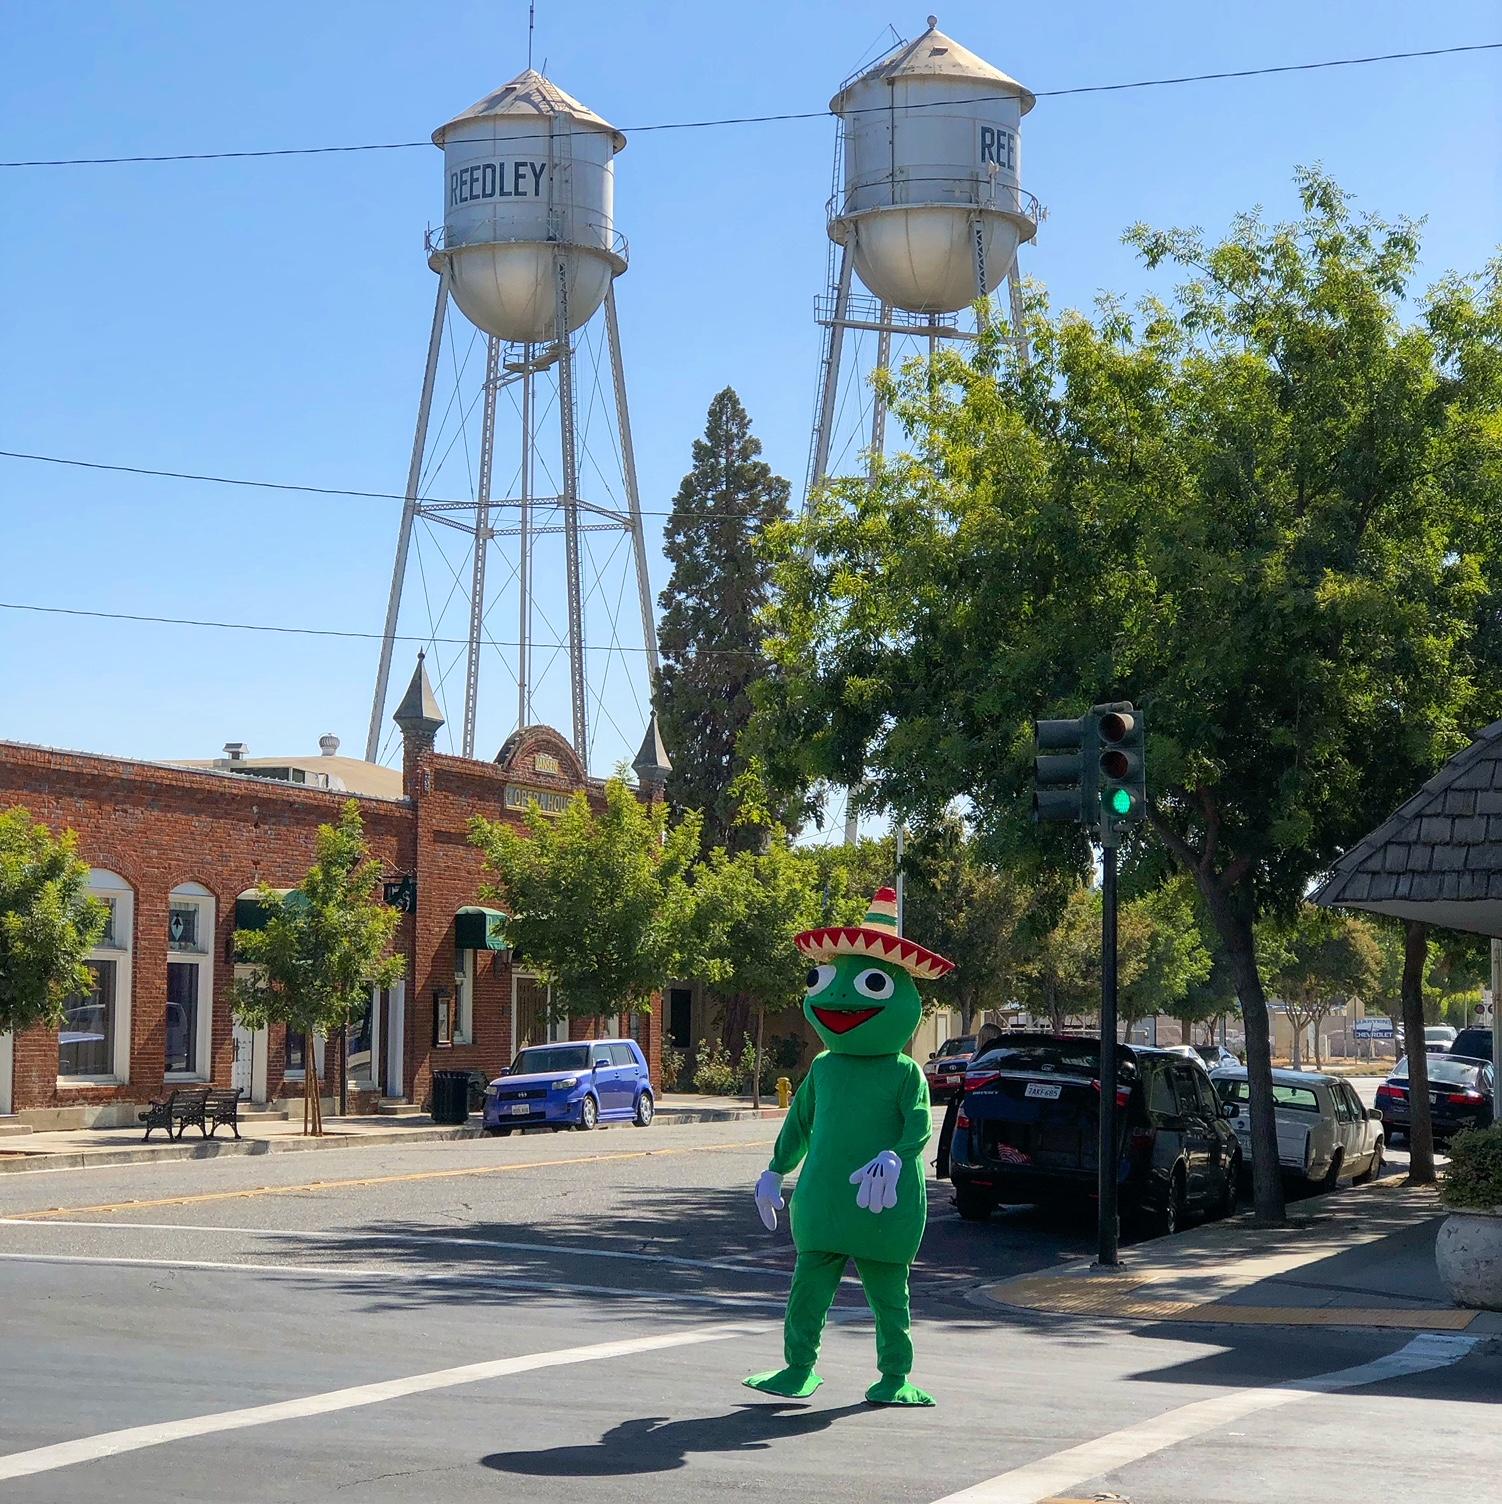 Reedley Christmas Parade 2019 Reedley Fiesta Gets a New Mascot: A Frog Named Ribberto   Kings